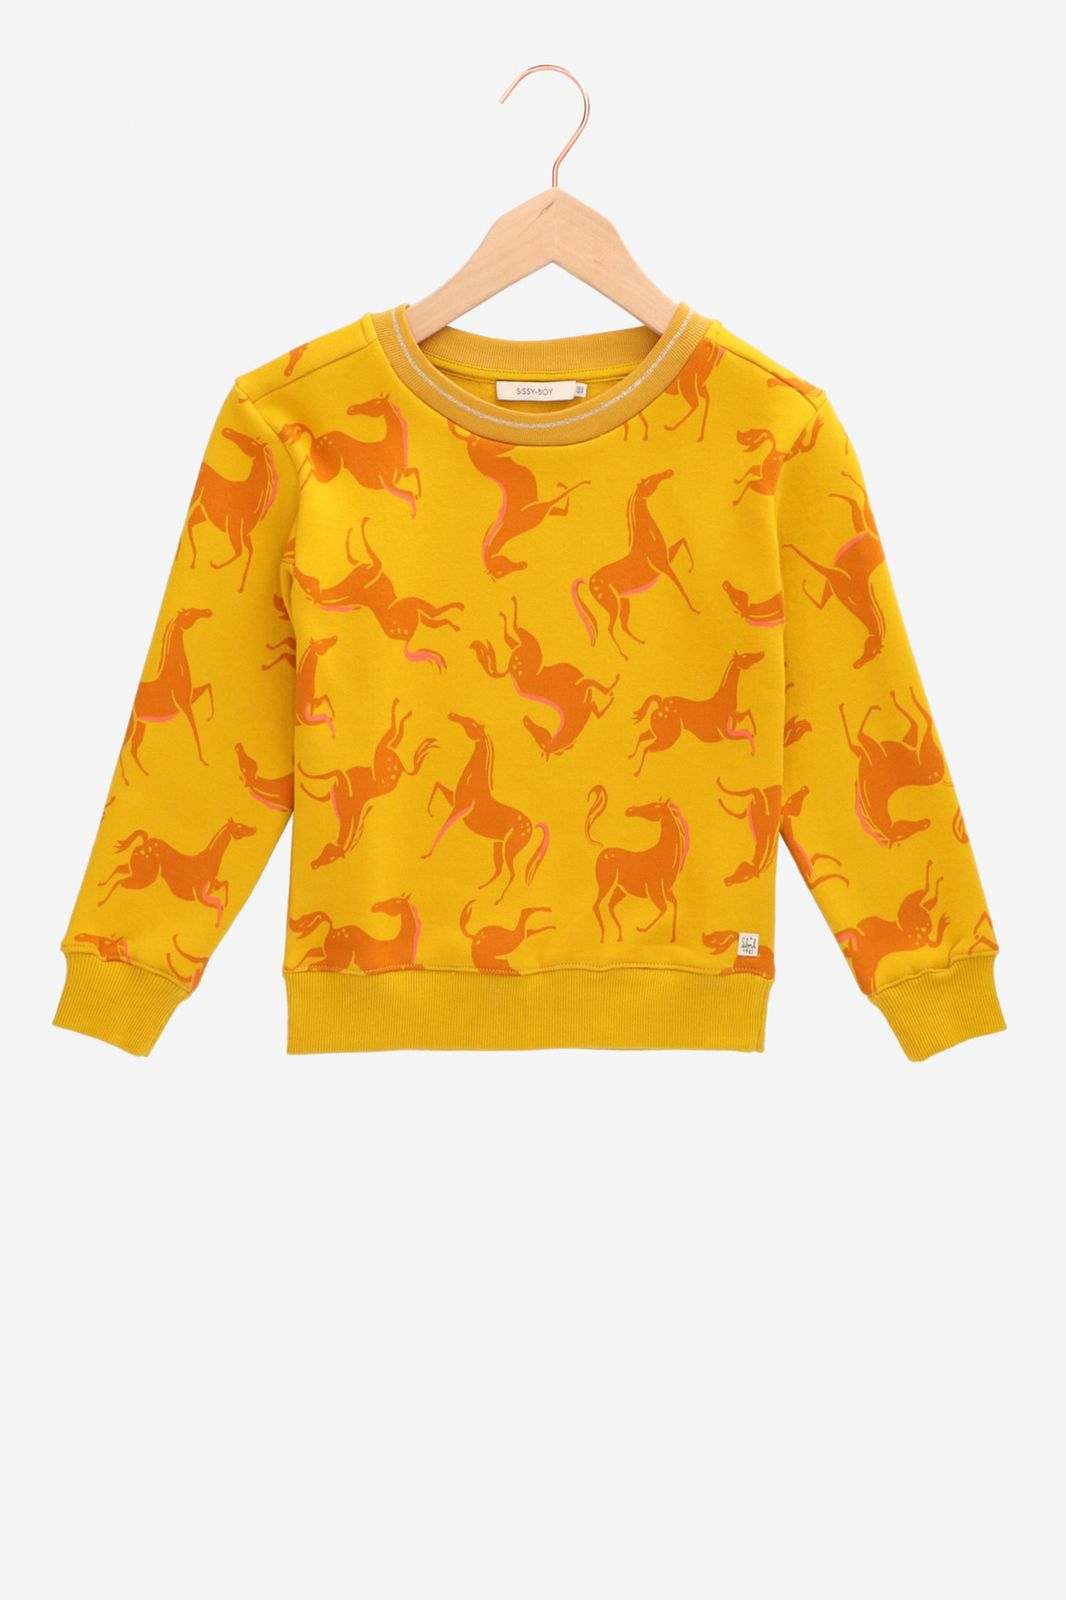 Gele sweater met paardenprint - Kids | Sissy-Boy